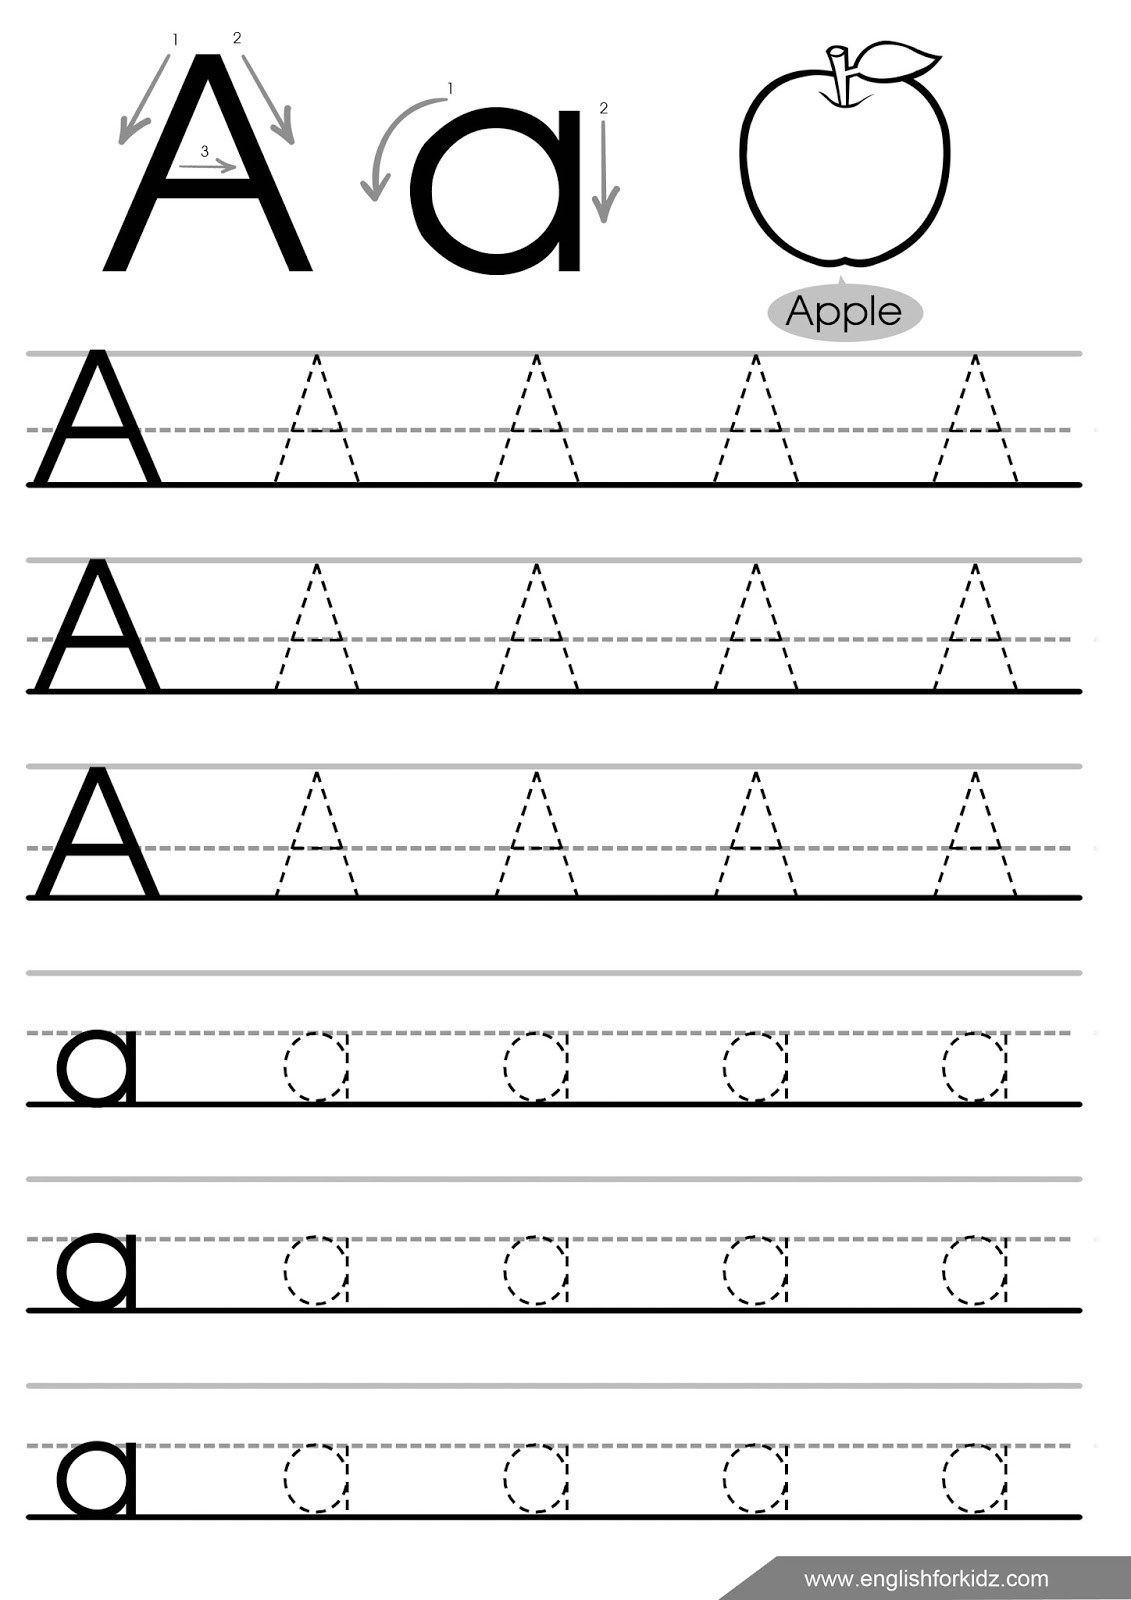 Math Worksheet : Alphabet Tracing Worksheets For in Alphabet Tracing For Kindergarten